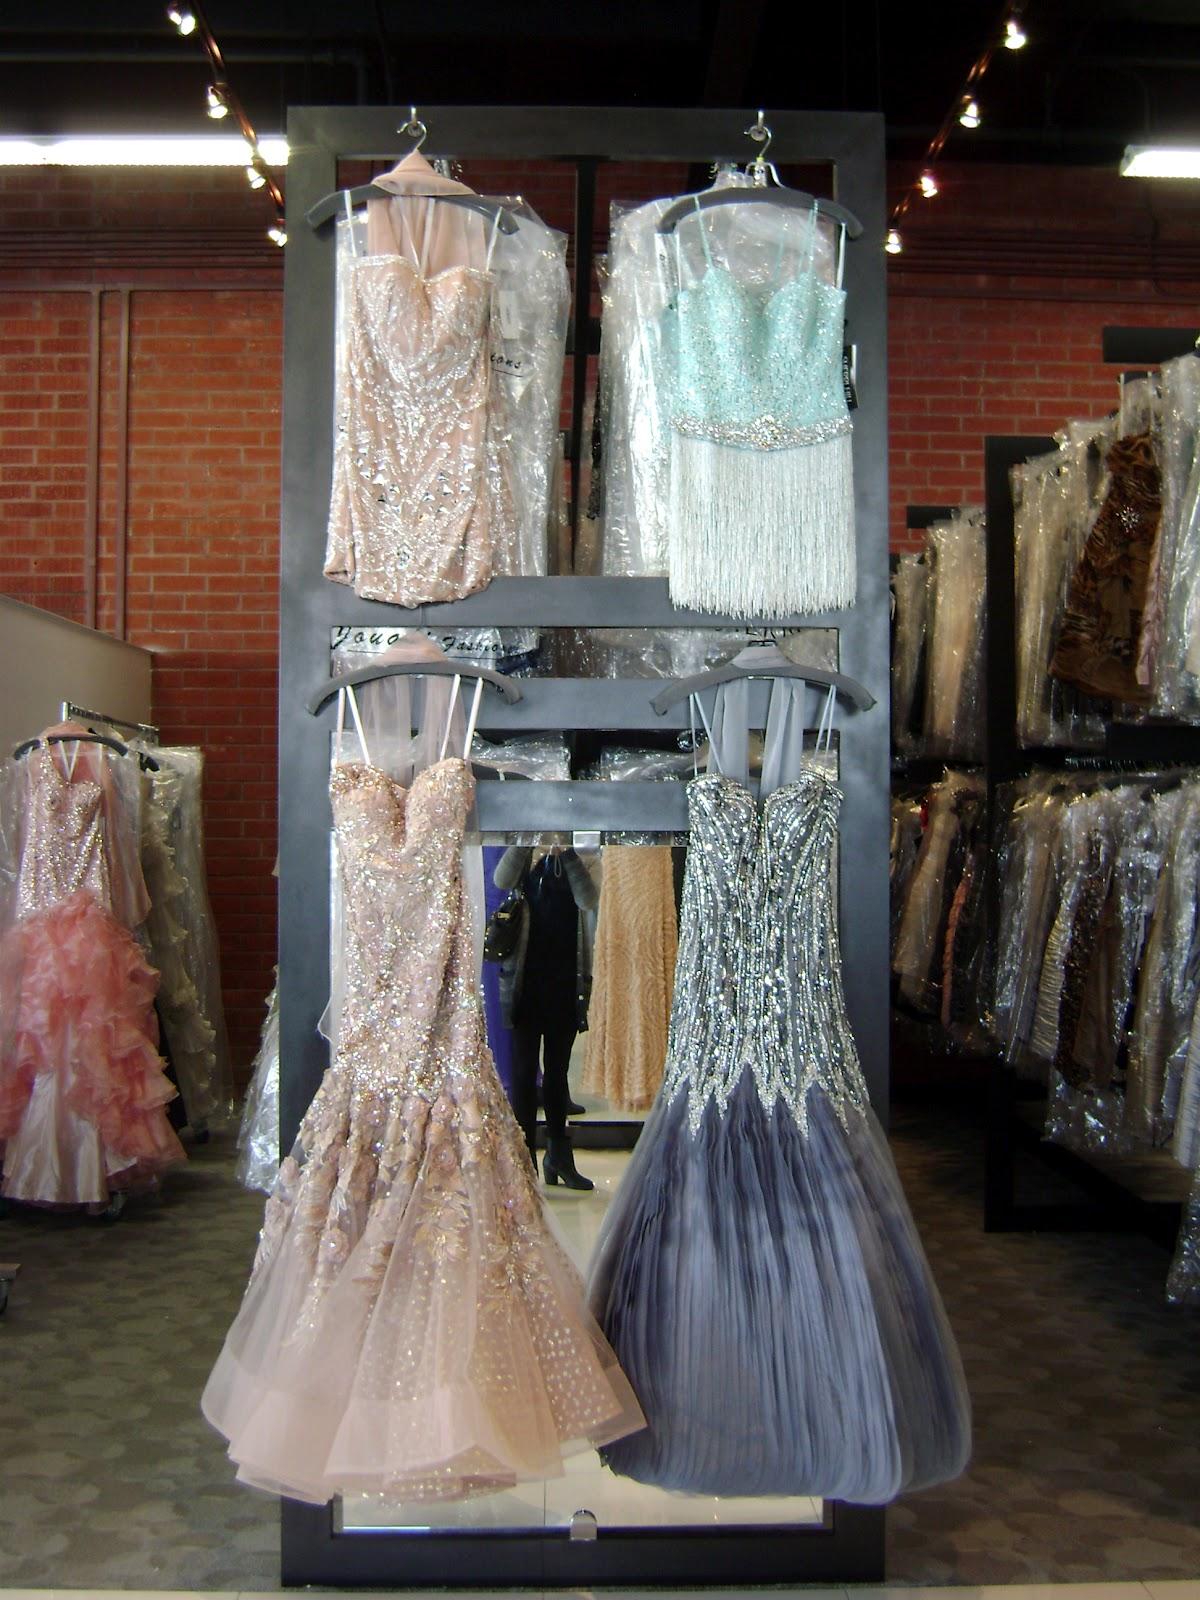 Prom Dresses: Prom Dresses Garment District Los Angeles